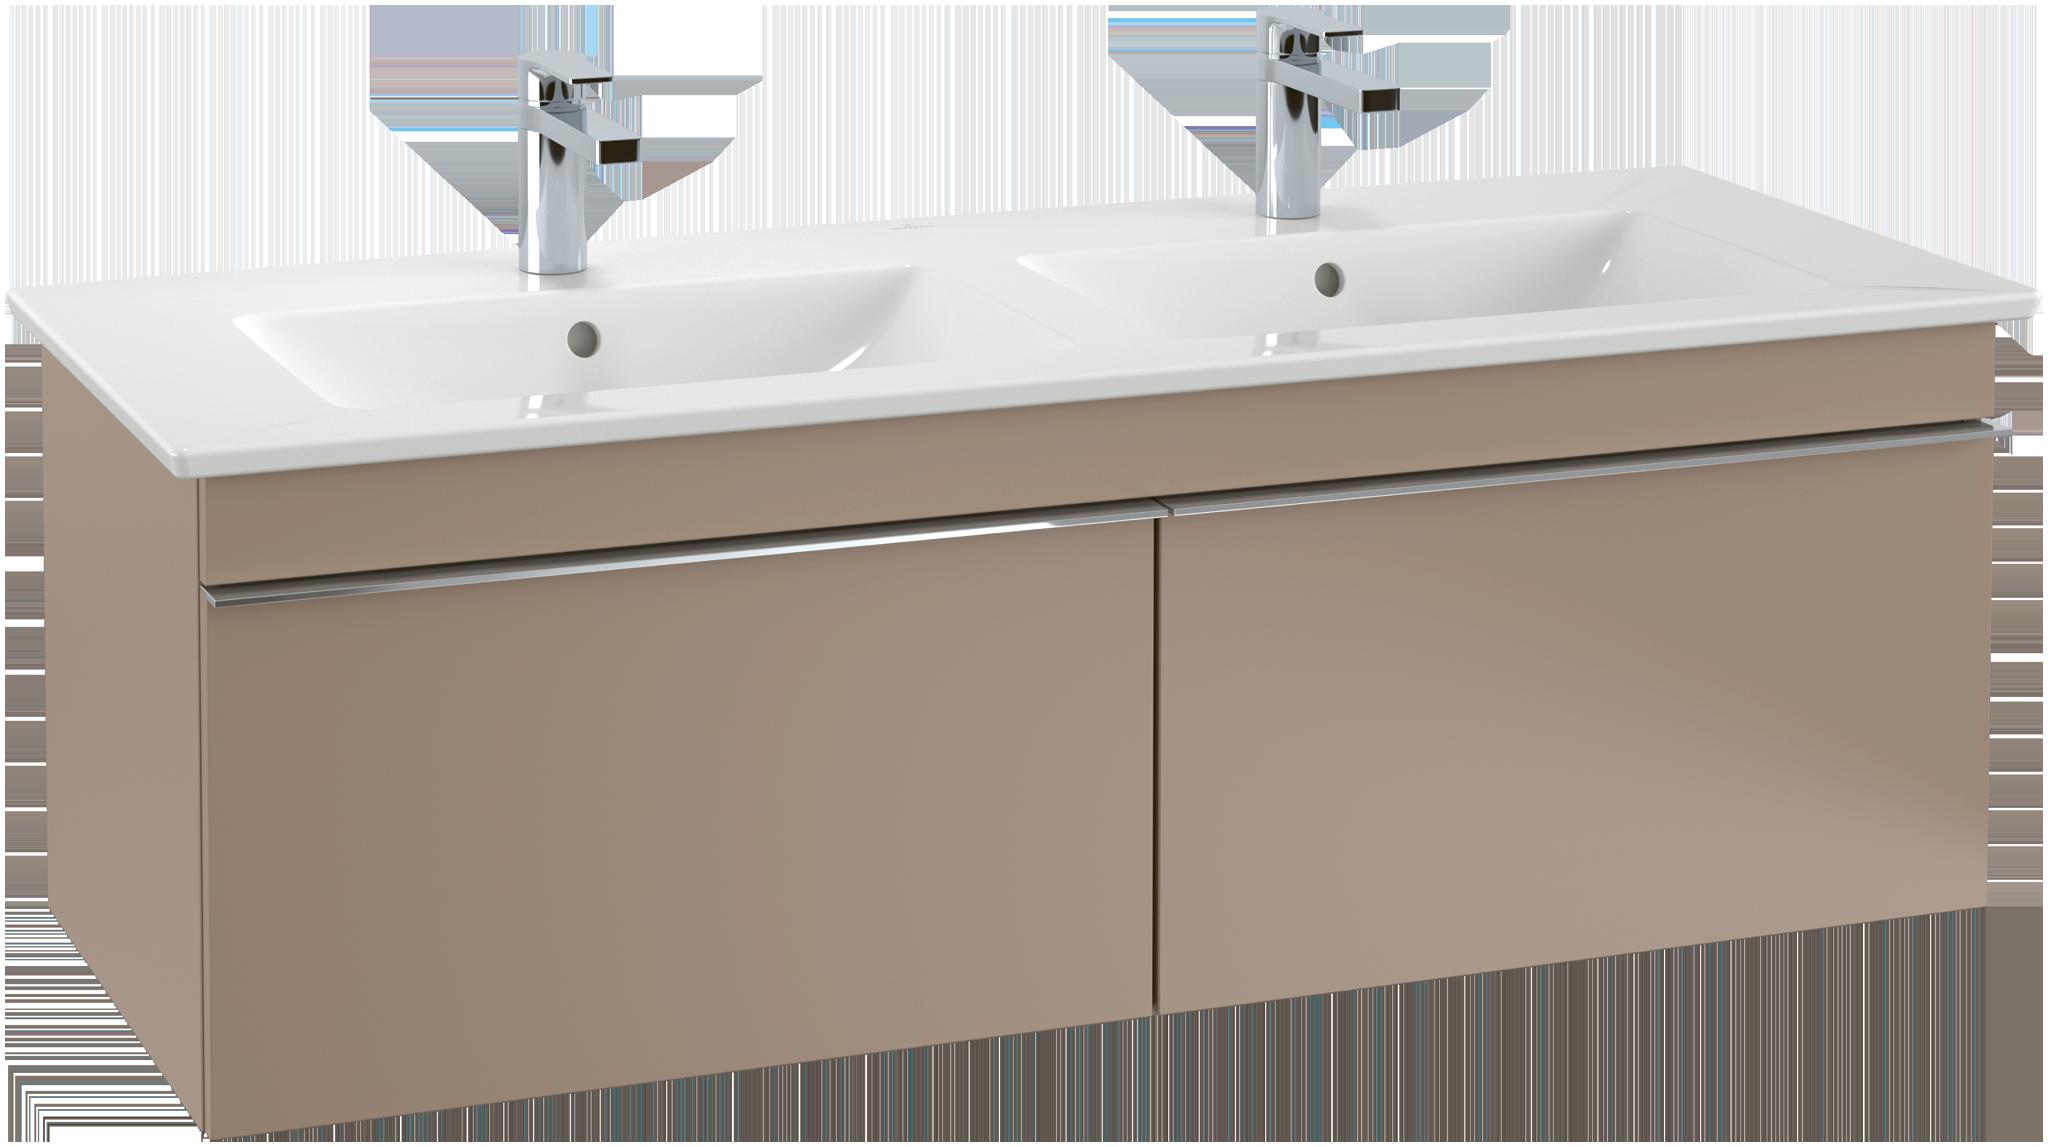 Venticello meuble sous lavabo a93901 villeroy boch for Meuble sous lavabo fly